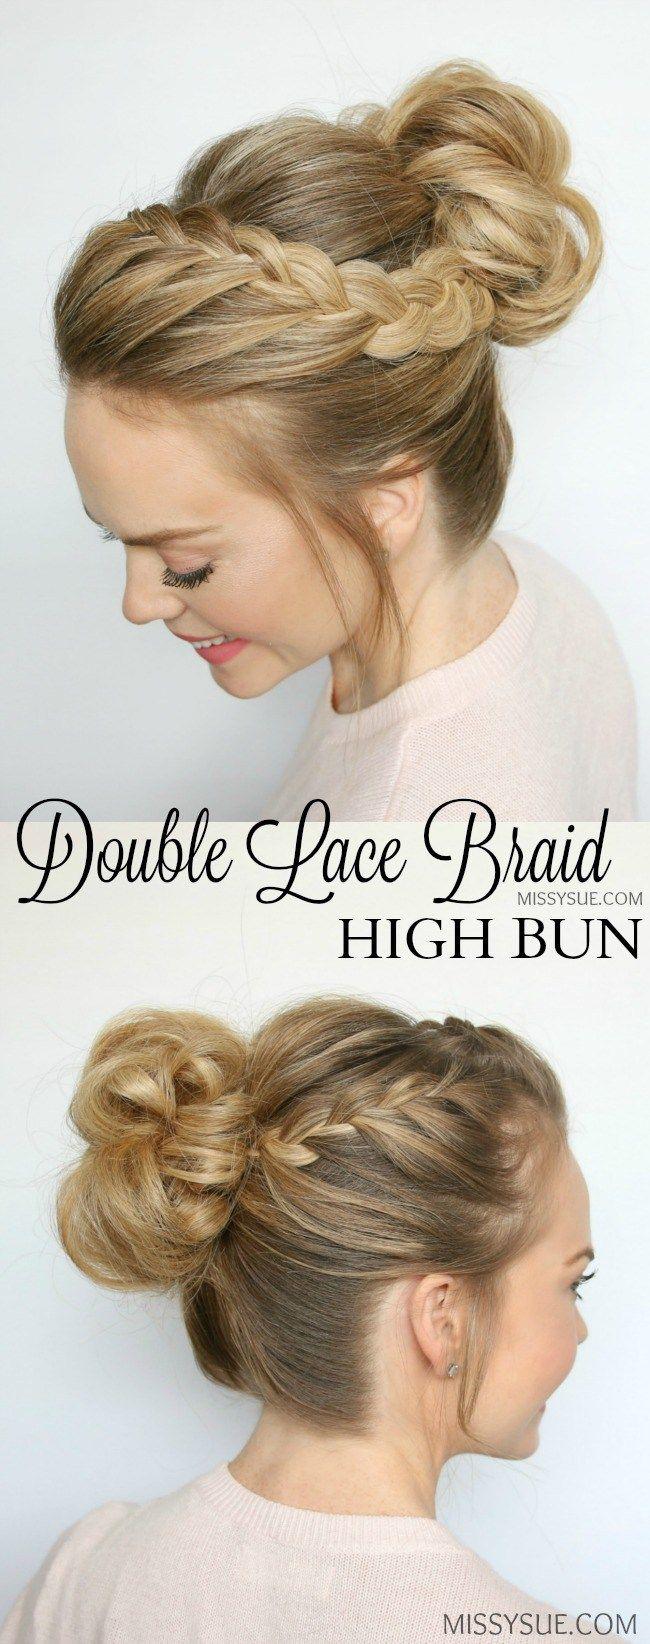 Double Lace Braid High Bun